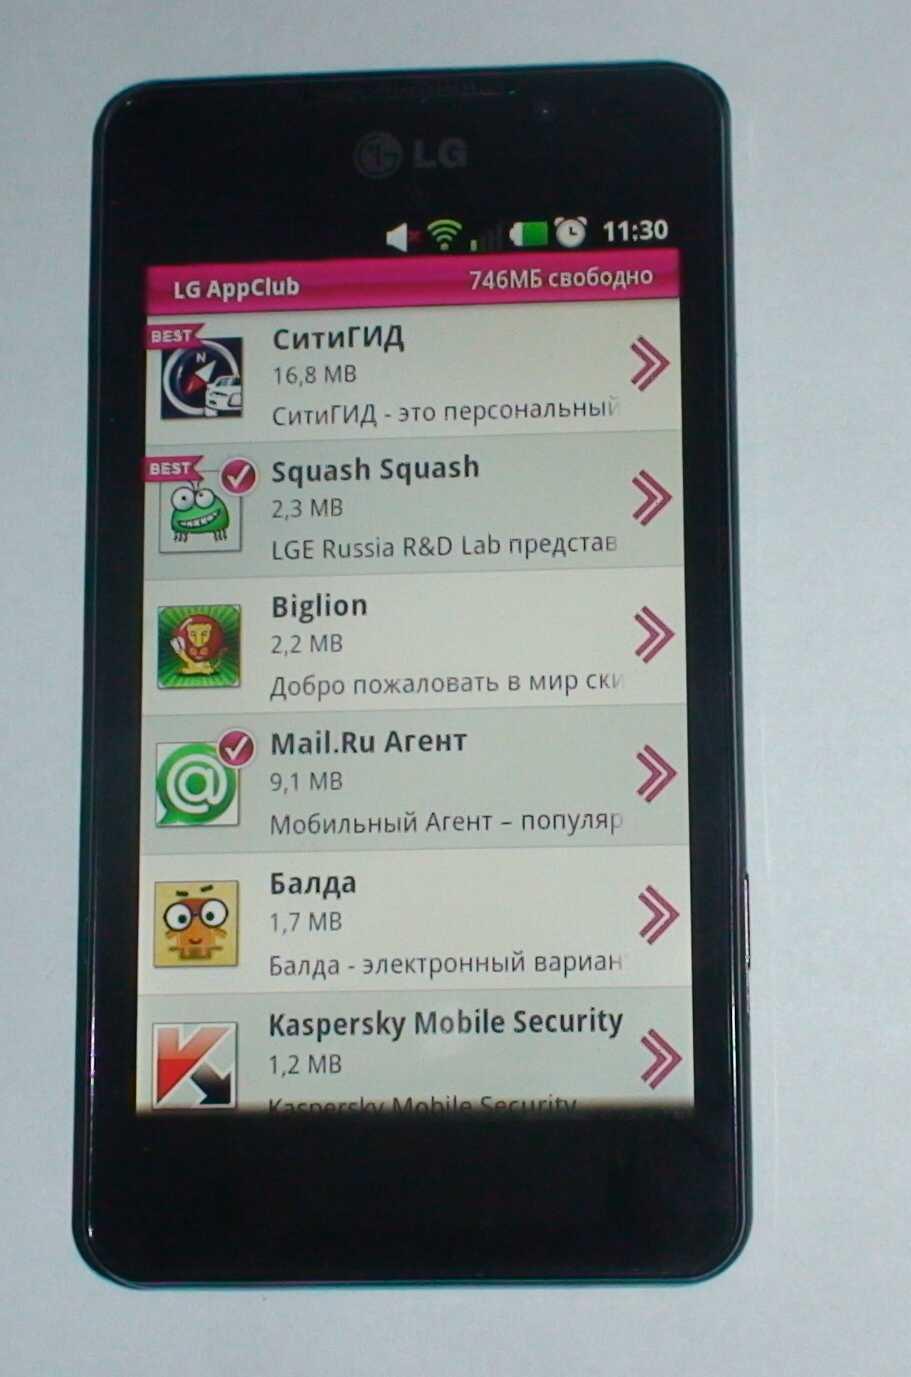 Программы в LG AppClub